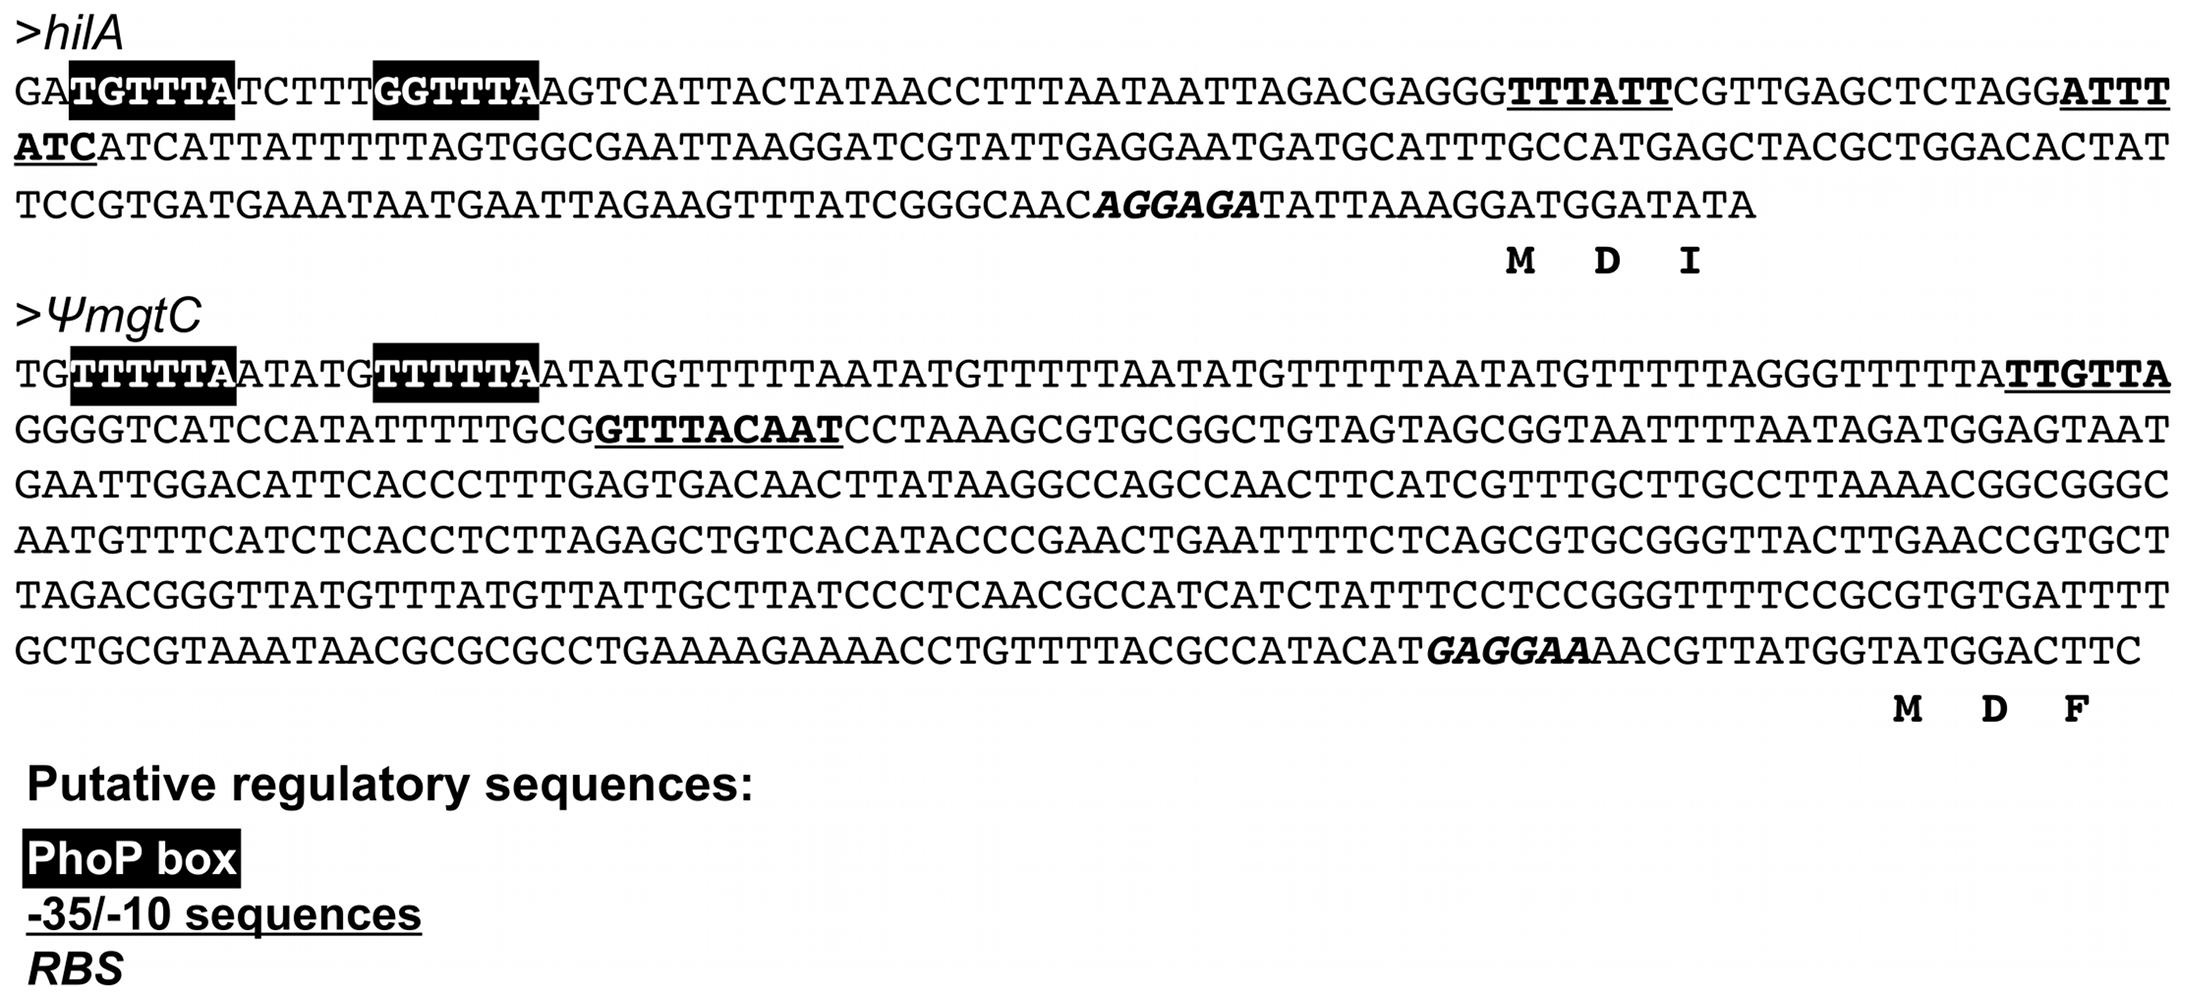 The putative promoter regions of the <i>S. glossinidius hilA</i> homologue and the <i>mgtCB</i> pseudo-operon contain canonical PhoP boxes.